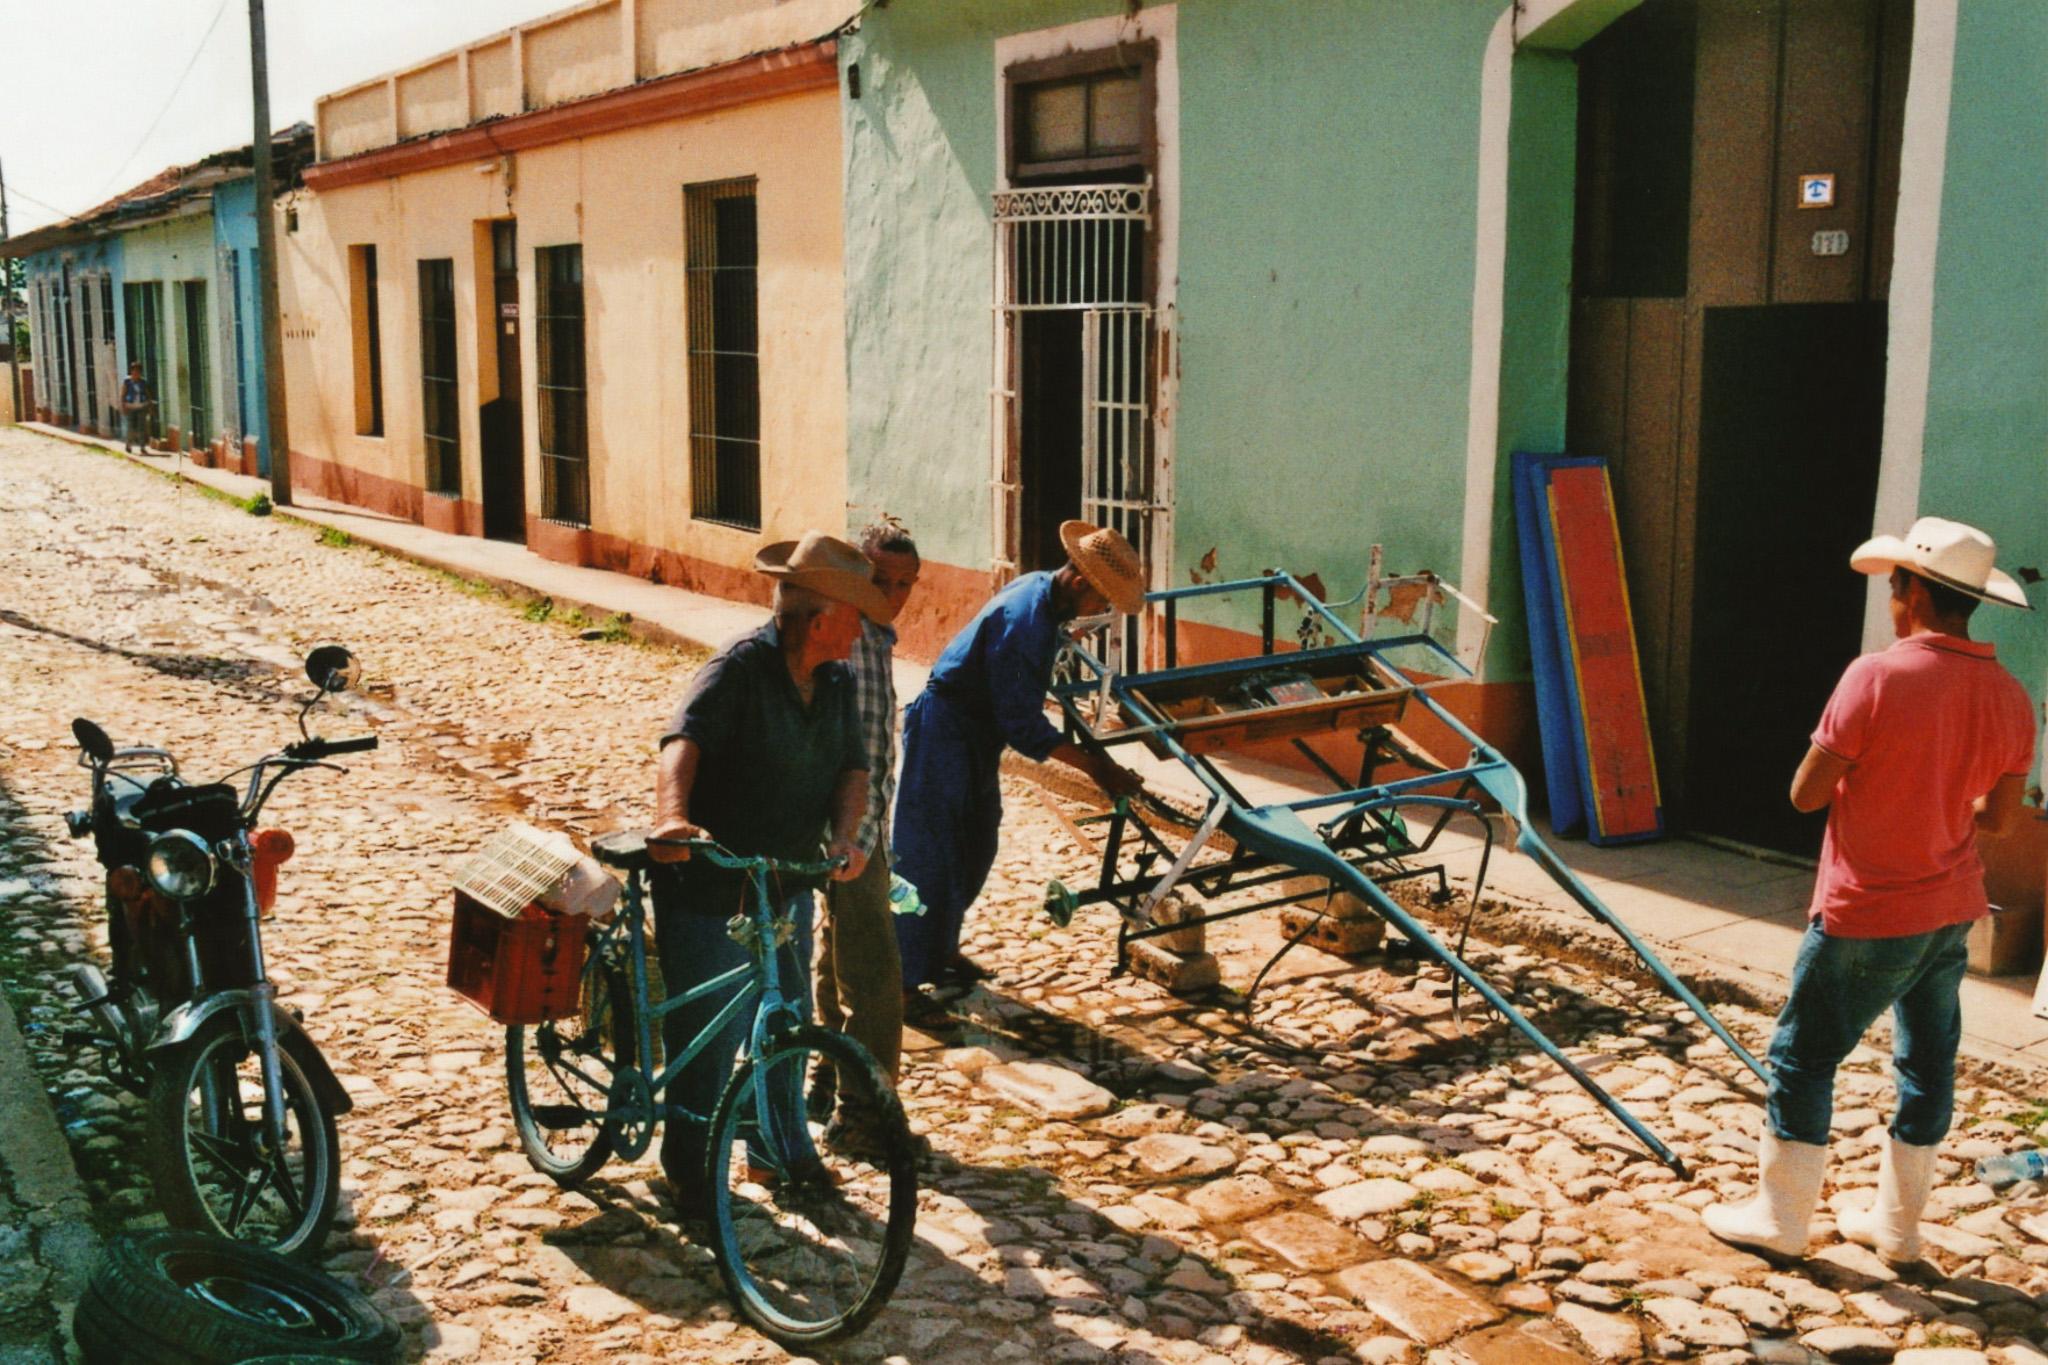 Kuba-2017-12-Analog-005.jpg